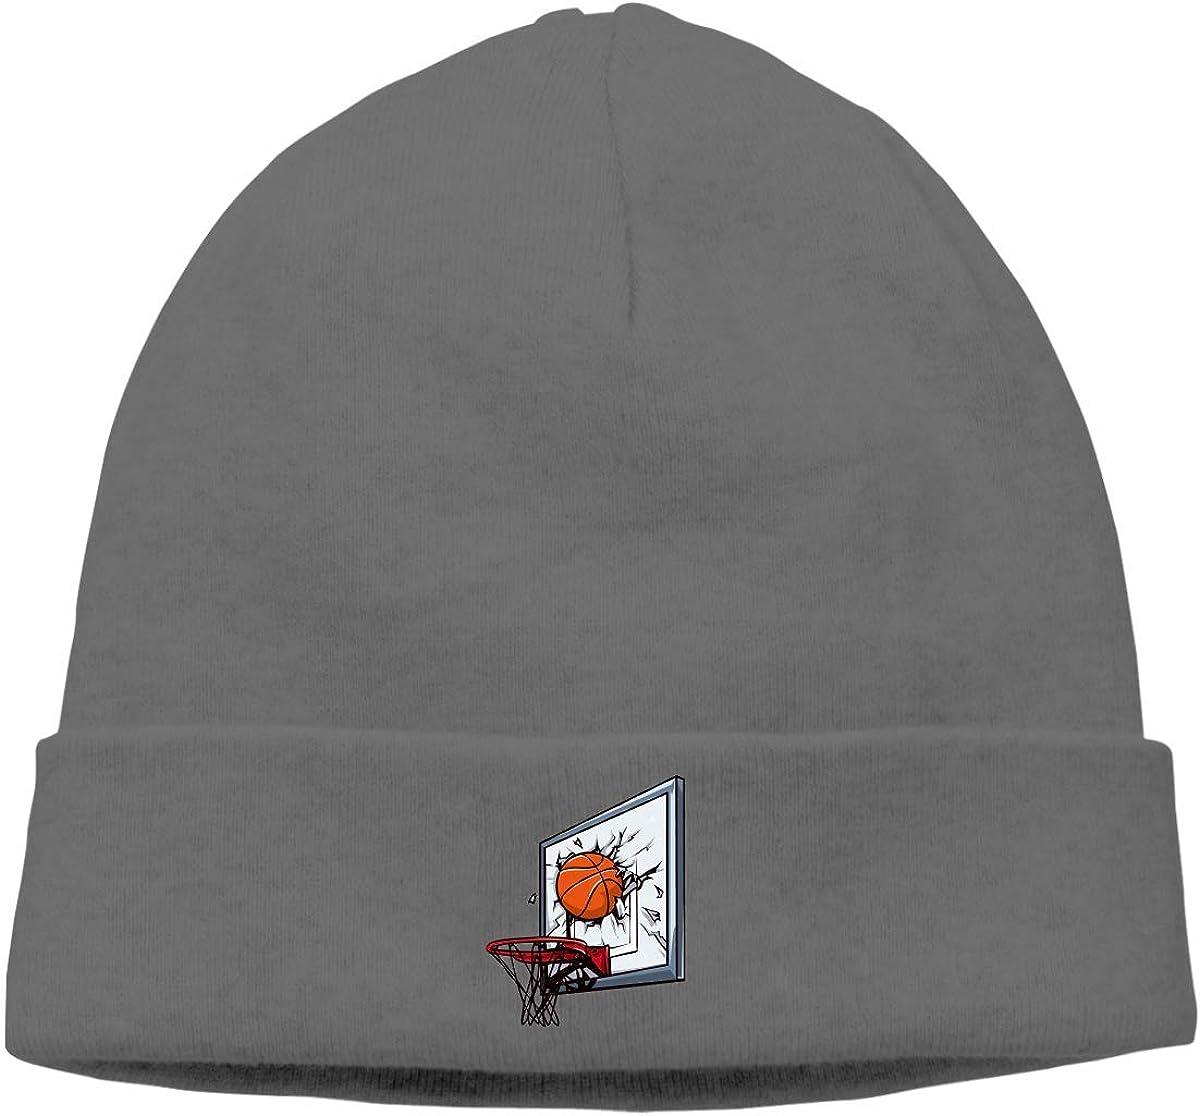 Adult Skull Cap Beanie Broken Basketball Rack Knitted Hat Headwear Winter Warm Hip-hop Hat